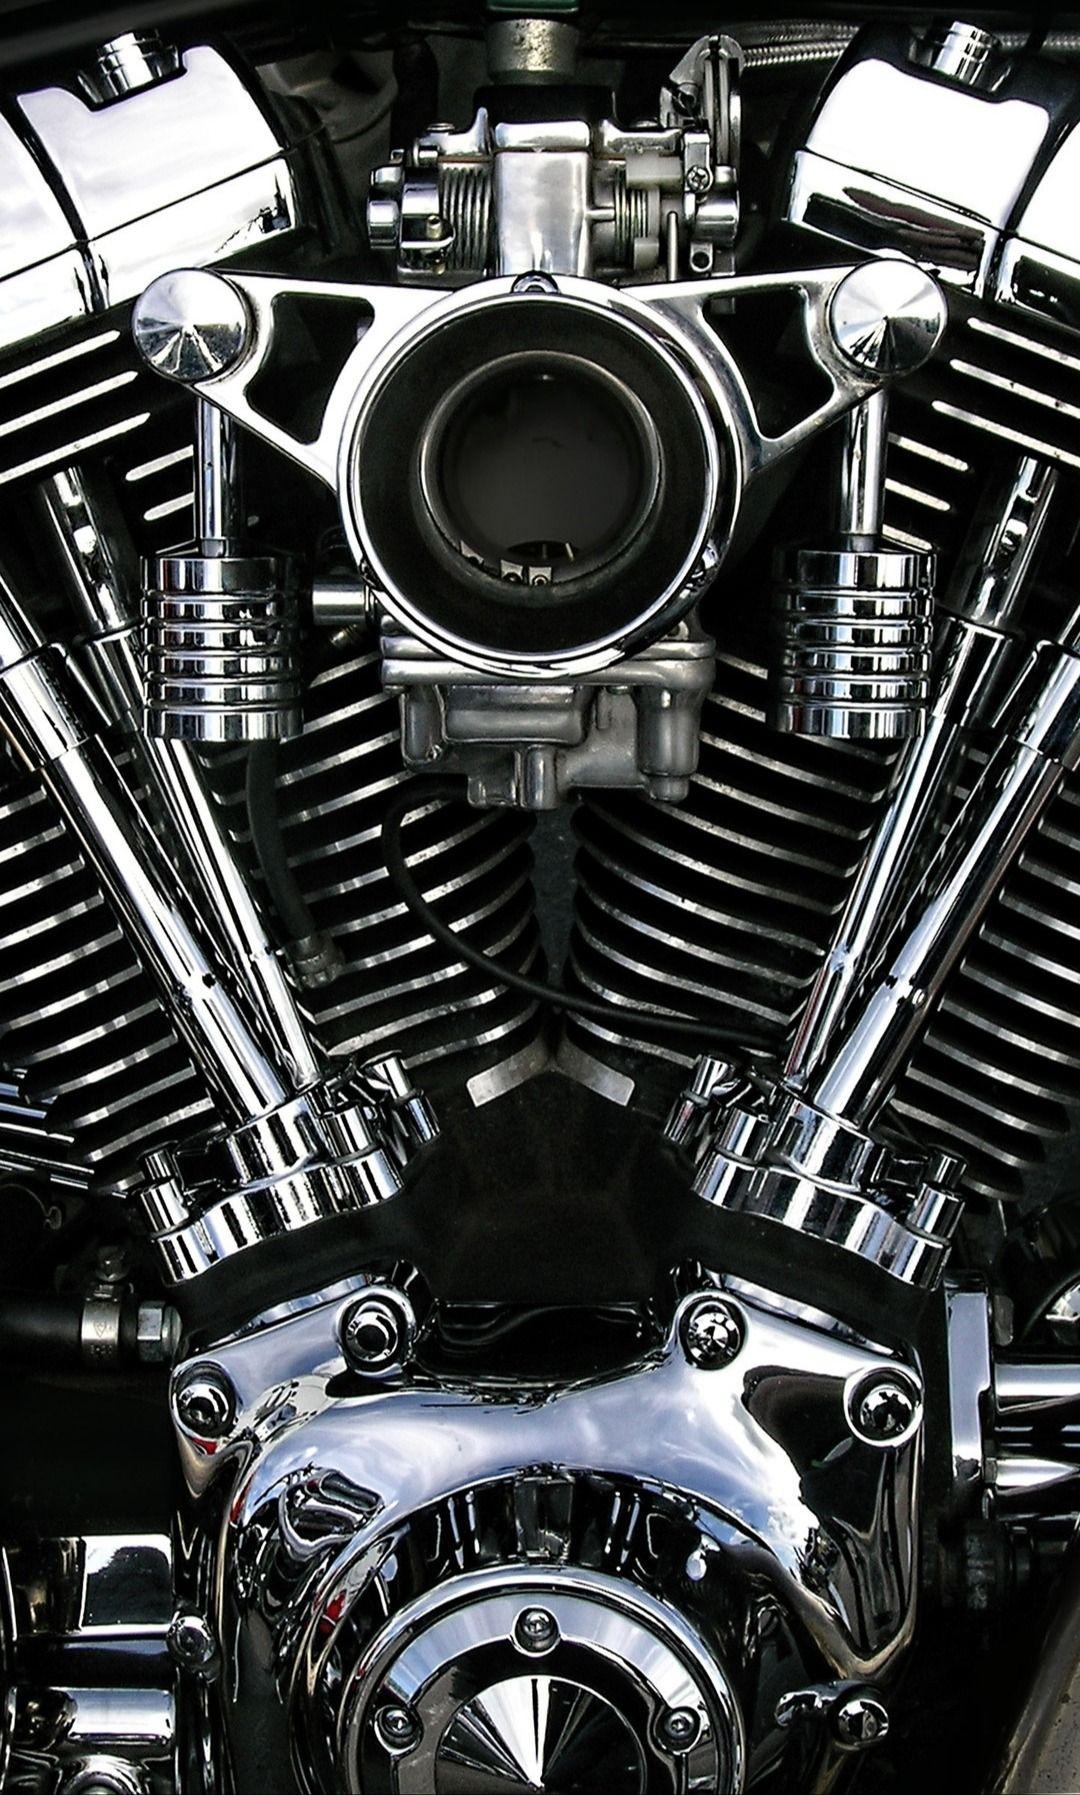 Pin By Yukiikuop On Rods Motorcycle Wallpaper Harley Davidson Wallpaper Harley Davidson Images